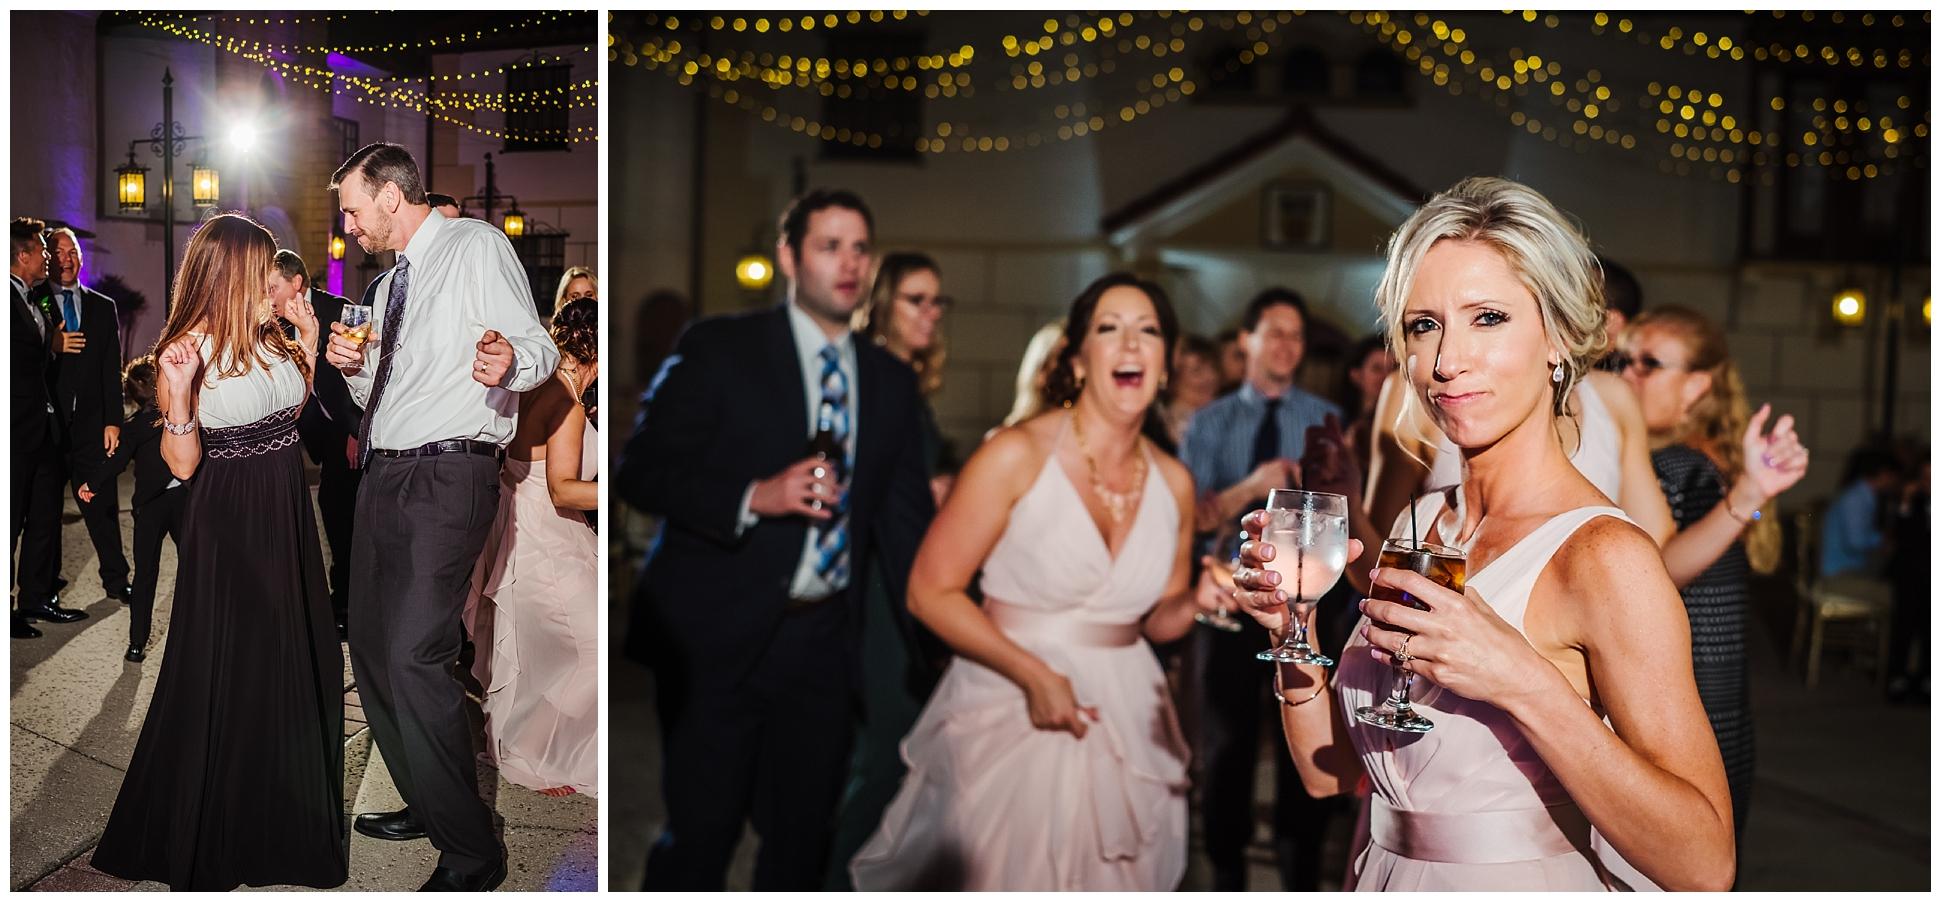 tampa-bradenton-wedding-photographer-south-florida-museum-classic-blush-gold-alpacas-sparklers_0083.jpg